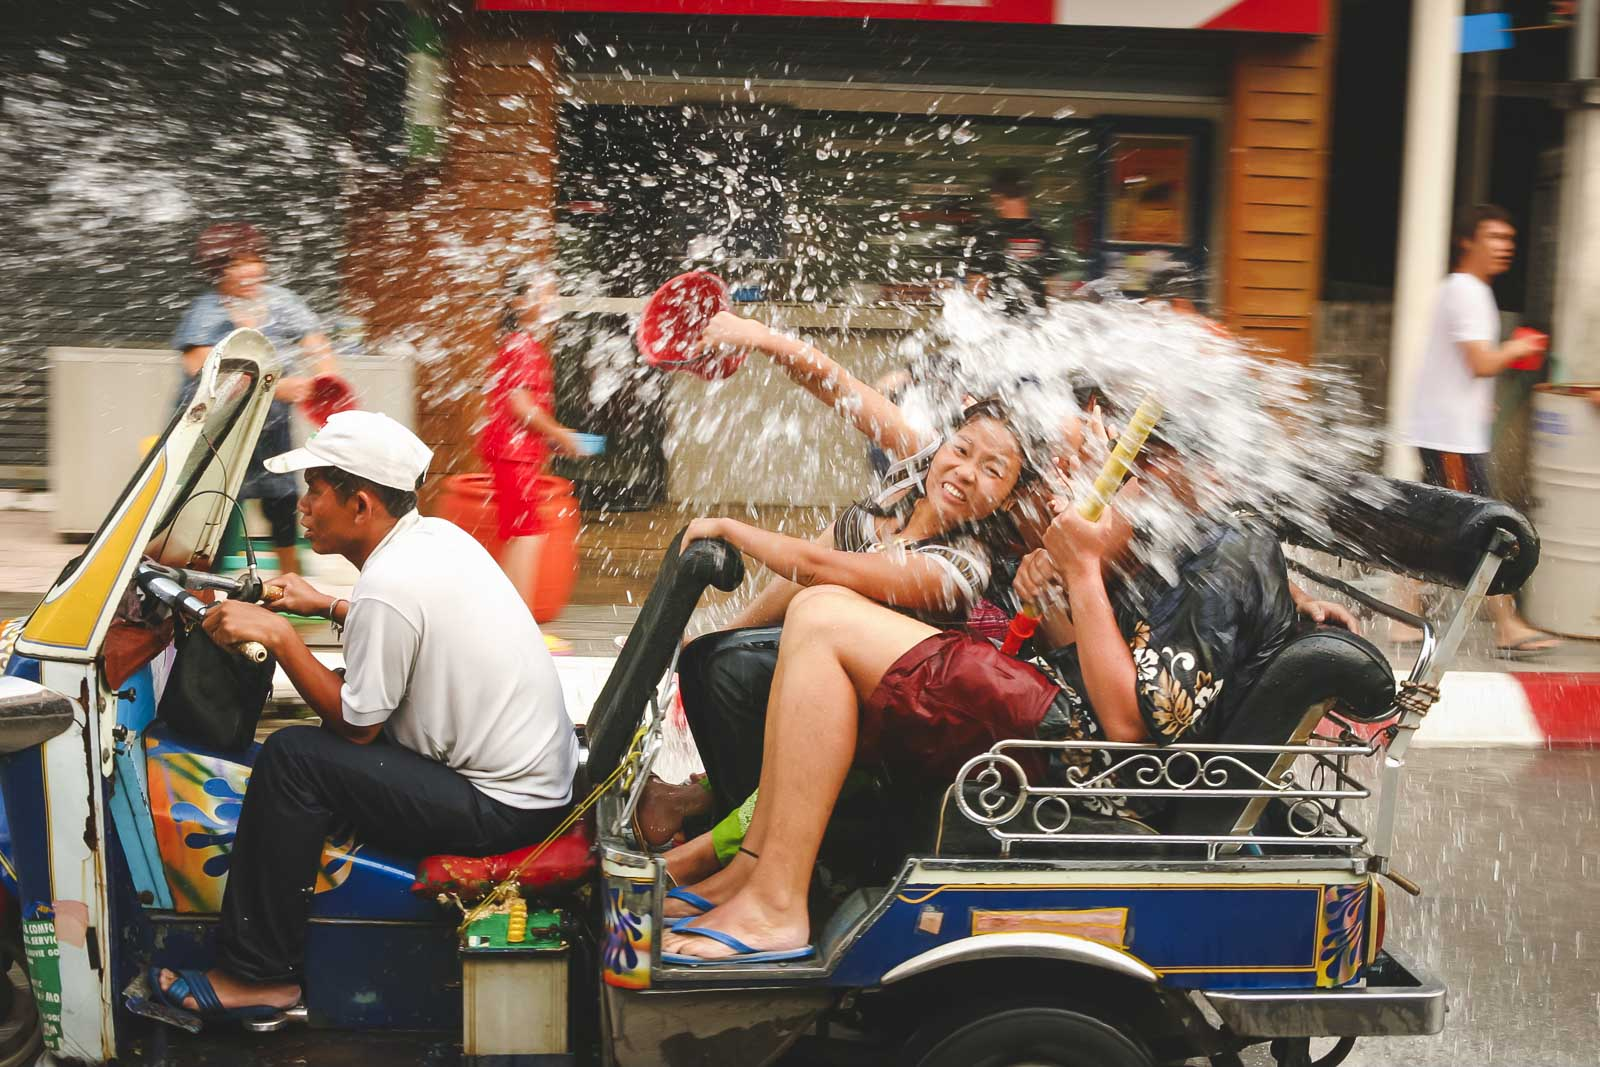 throwing water at songkran festival